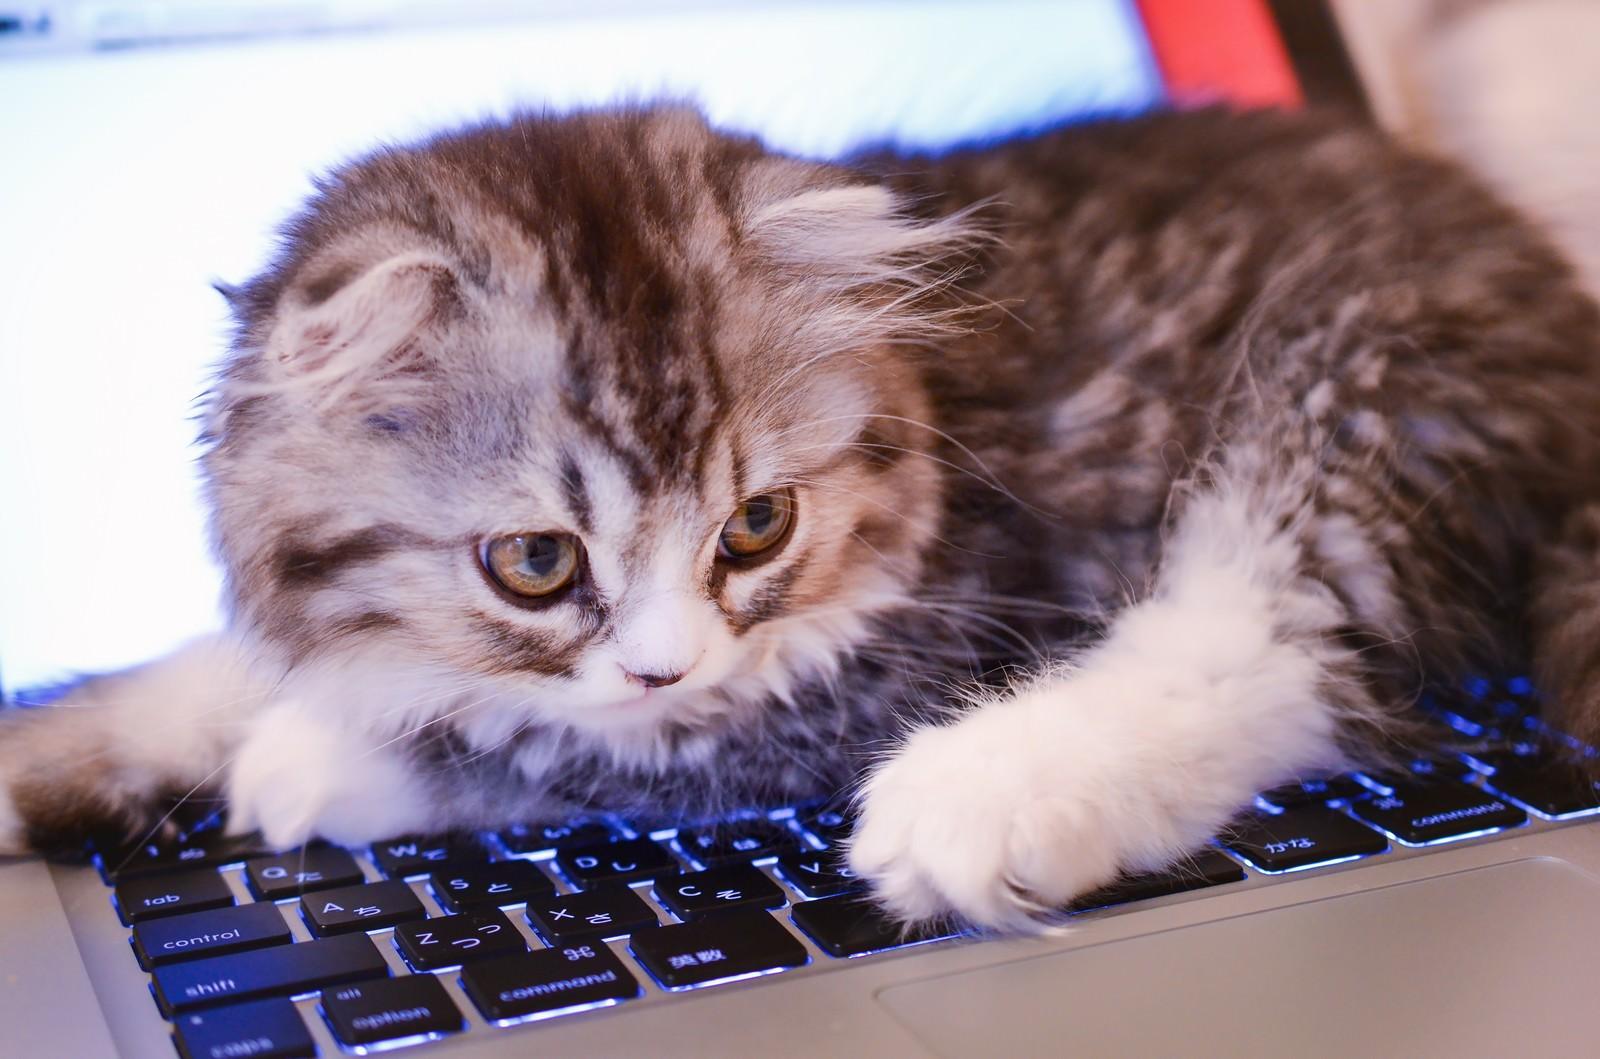 「MacBookのキーボードを占拠してるオス猫(スコティッシュフォールド)MacBookのキーボードを占拠してるオス猫(スコティッシュフォールド)」のフリー写真素材を拡大